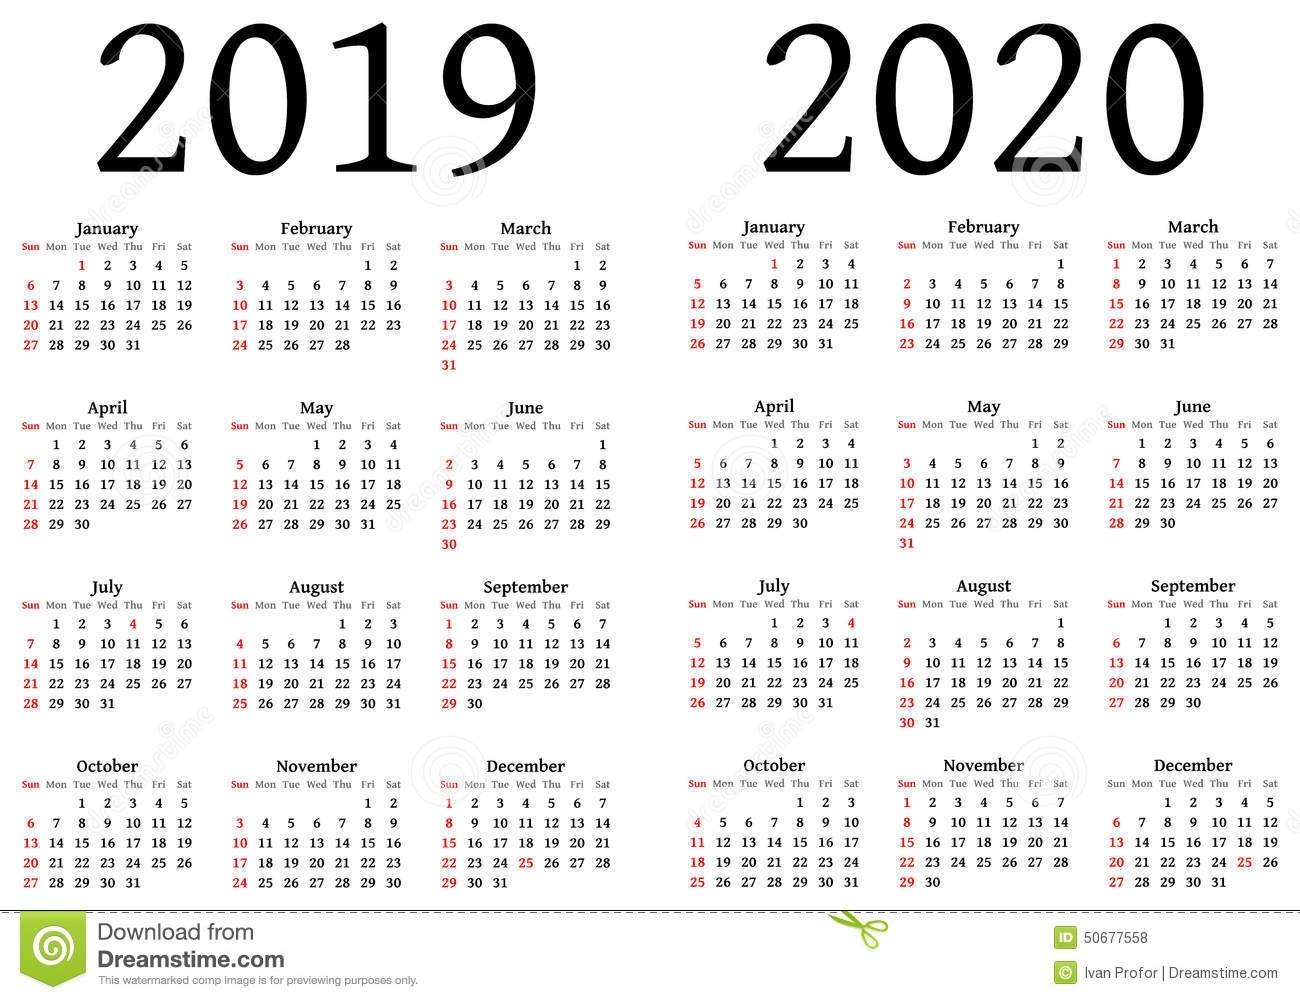 Printable Calendar For 2019 And 2020 | Printable Calendar 2019 throughout Printable Customizable Calander 2019-2020